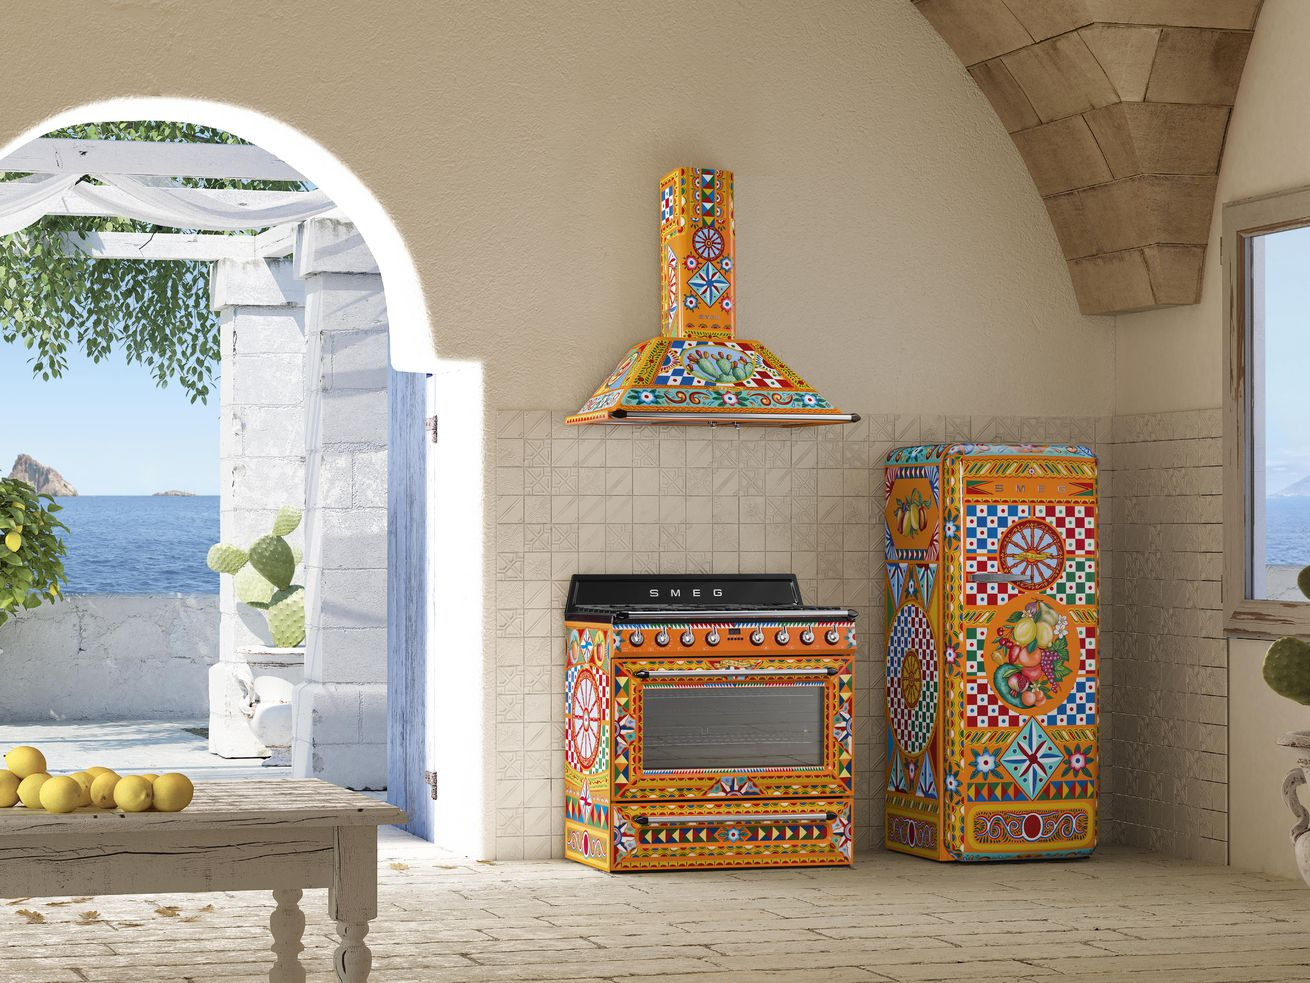 Dolce & Gabbana?s vibrant appliance line for Smeg expands again